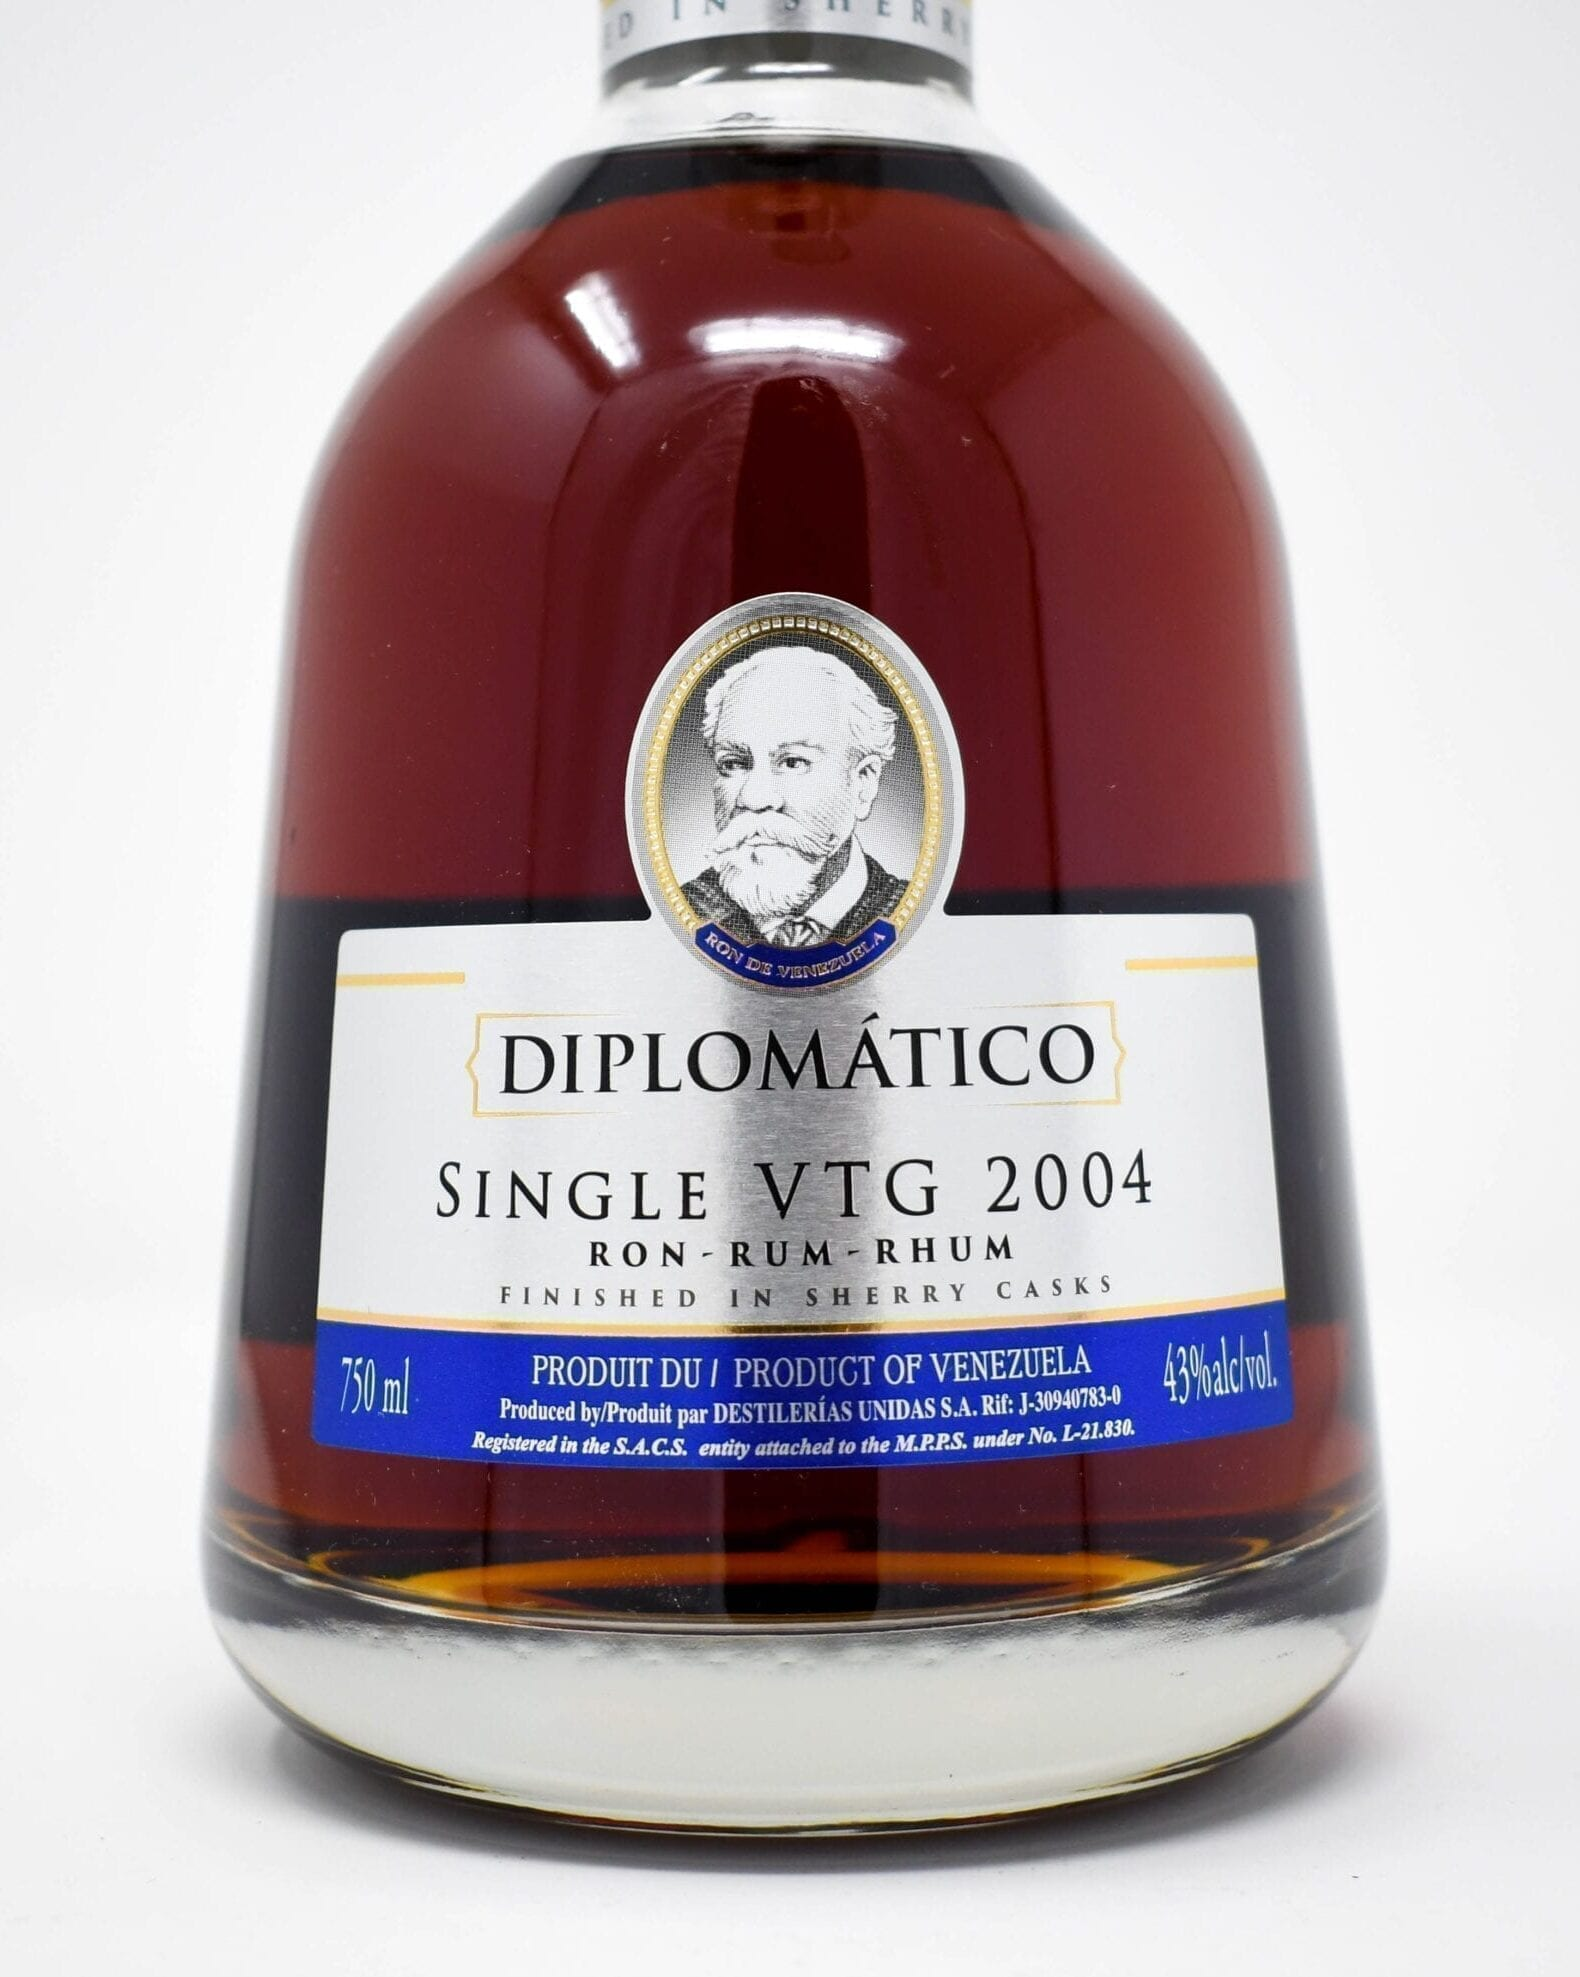 Diplomatico Rum, Single Vintage 2004